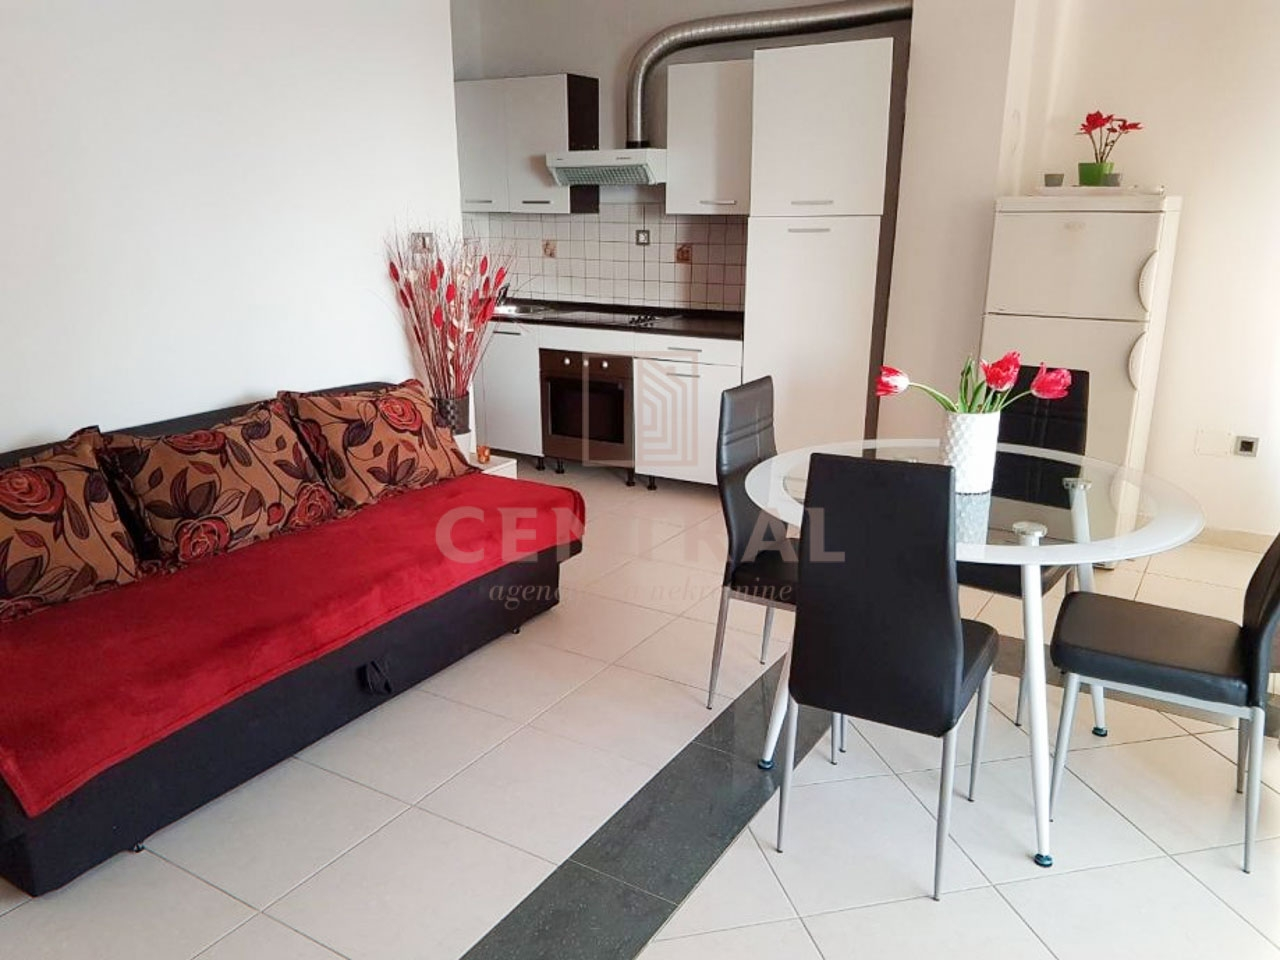 Crikvenica, dvosoban stan s dnevnim boravkom, 50 m2